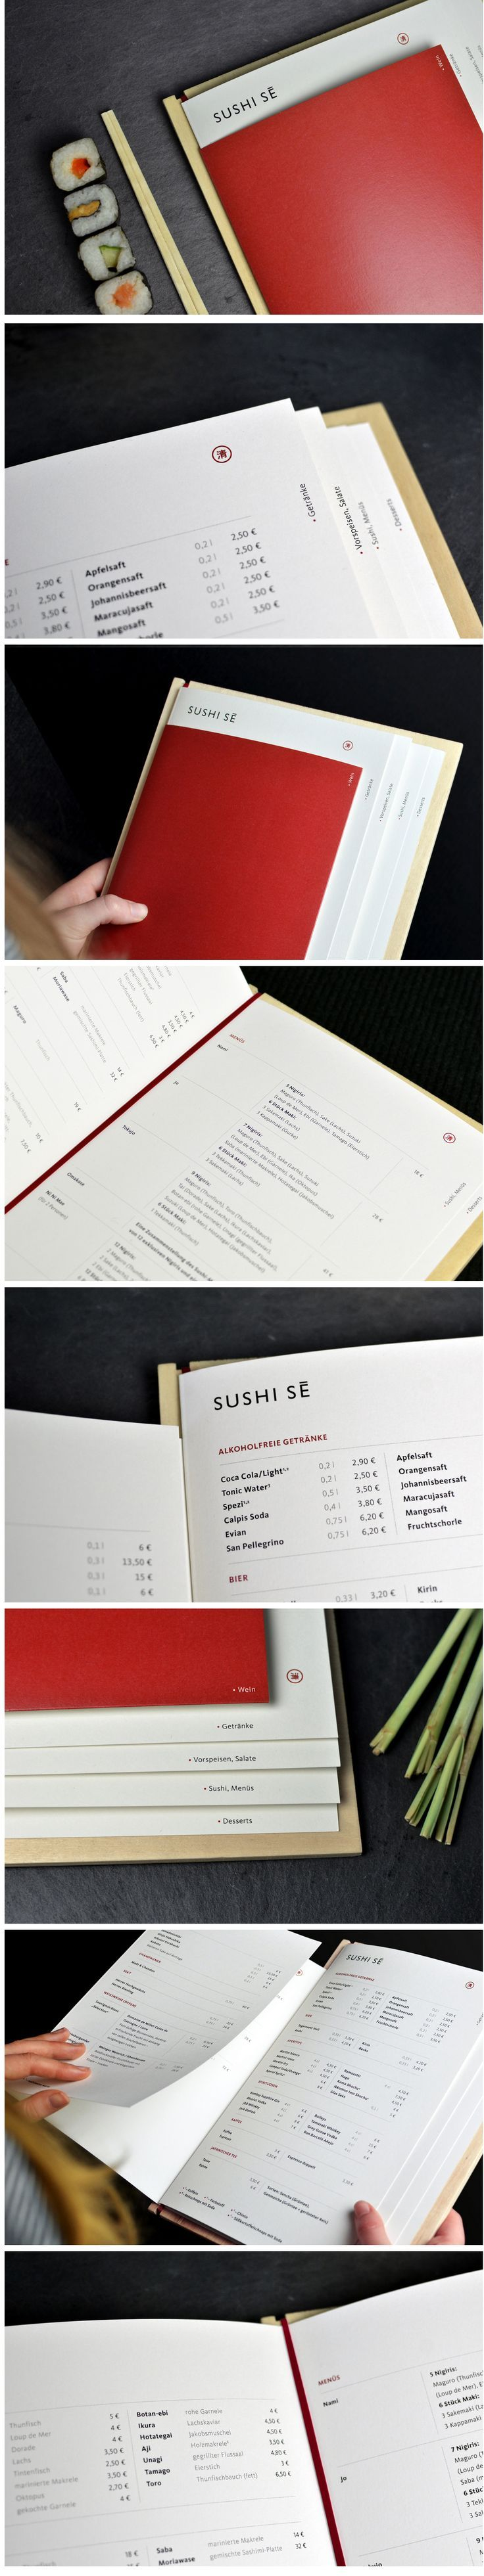 Sushi Sē Speisekarten Mehr / Menu Japanese